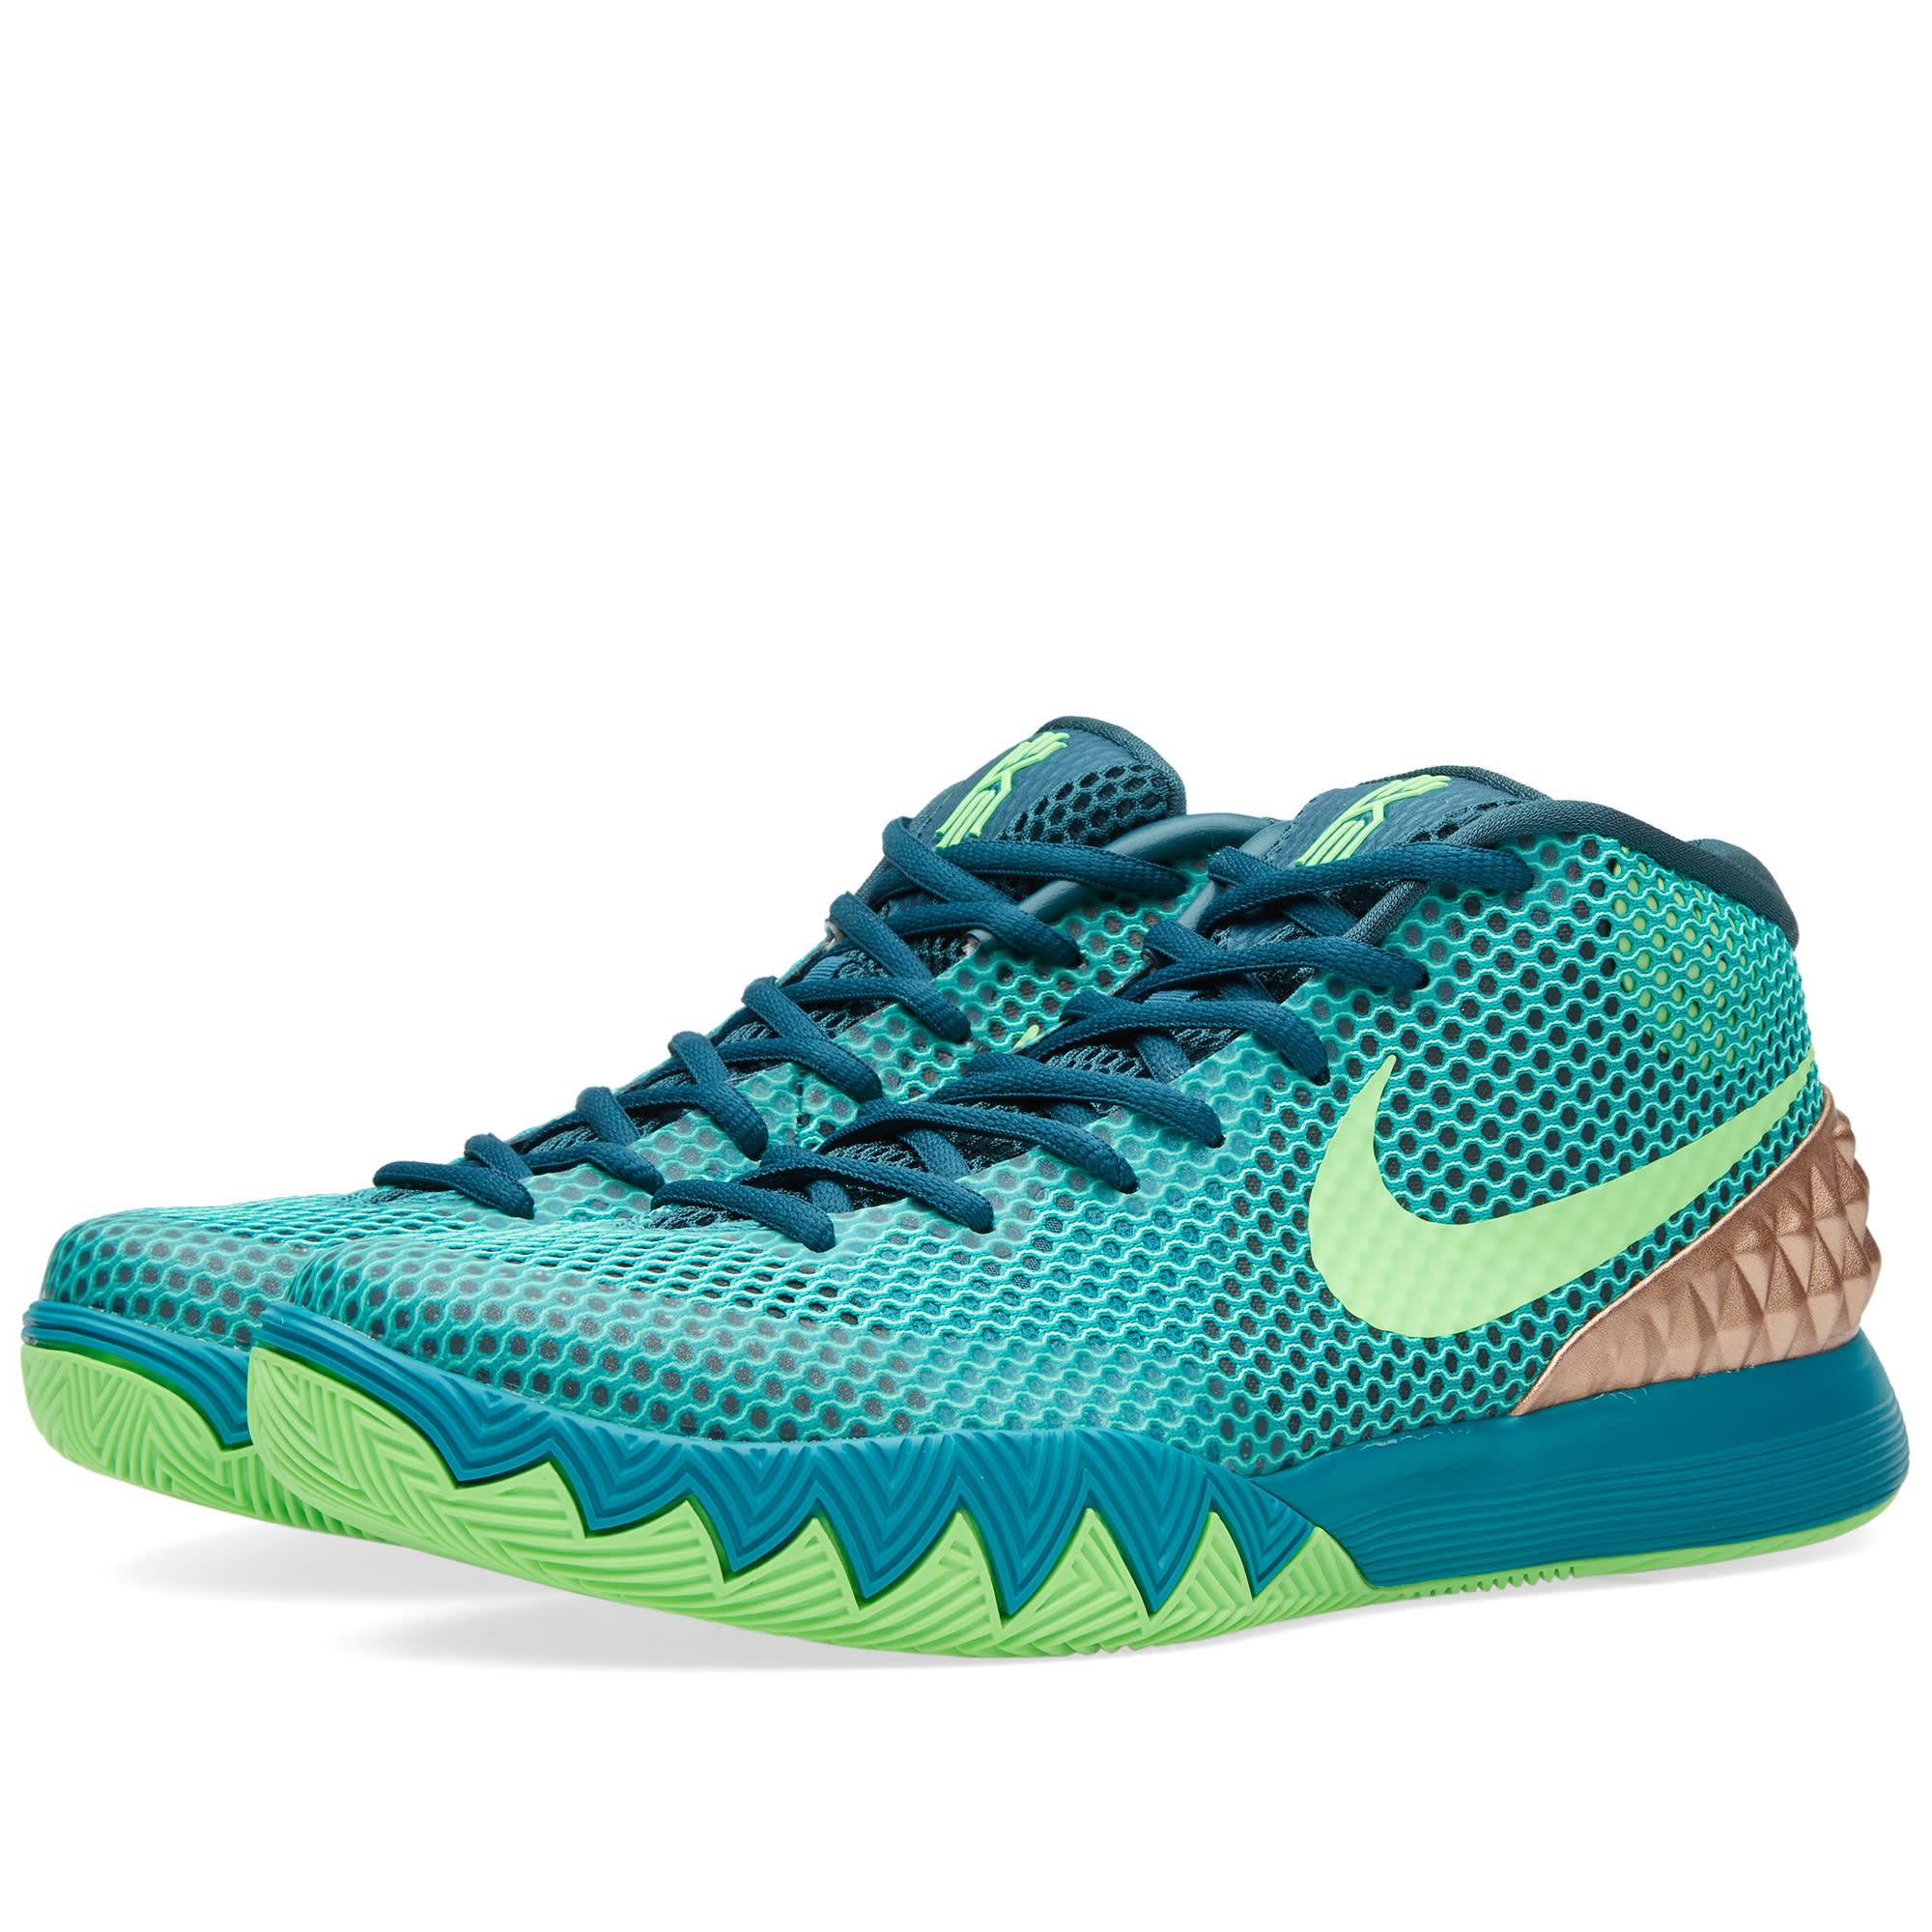 Nike Kyrie 1 (Teal & Green Strike)